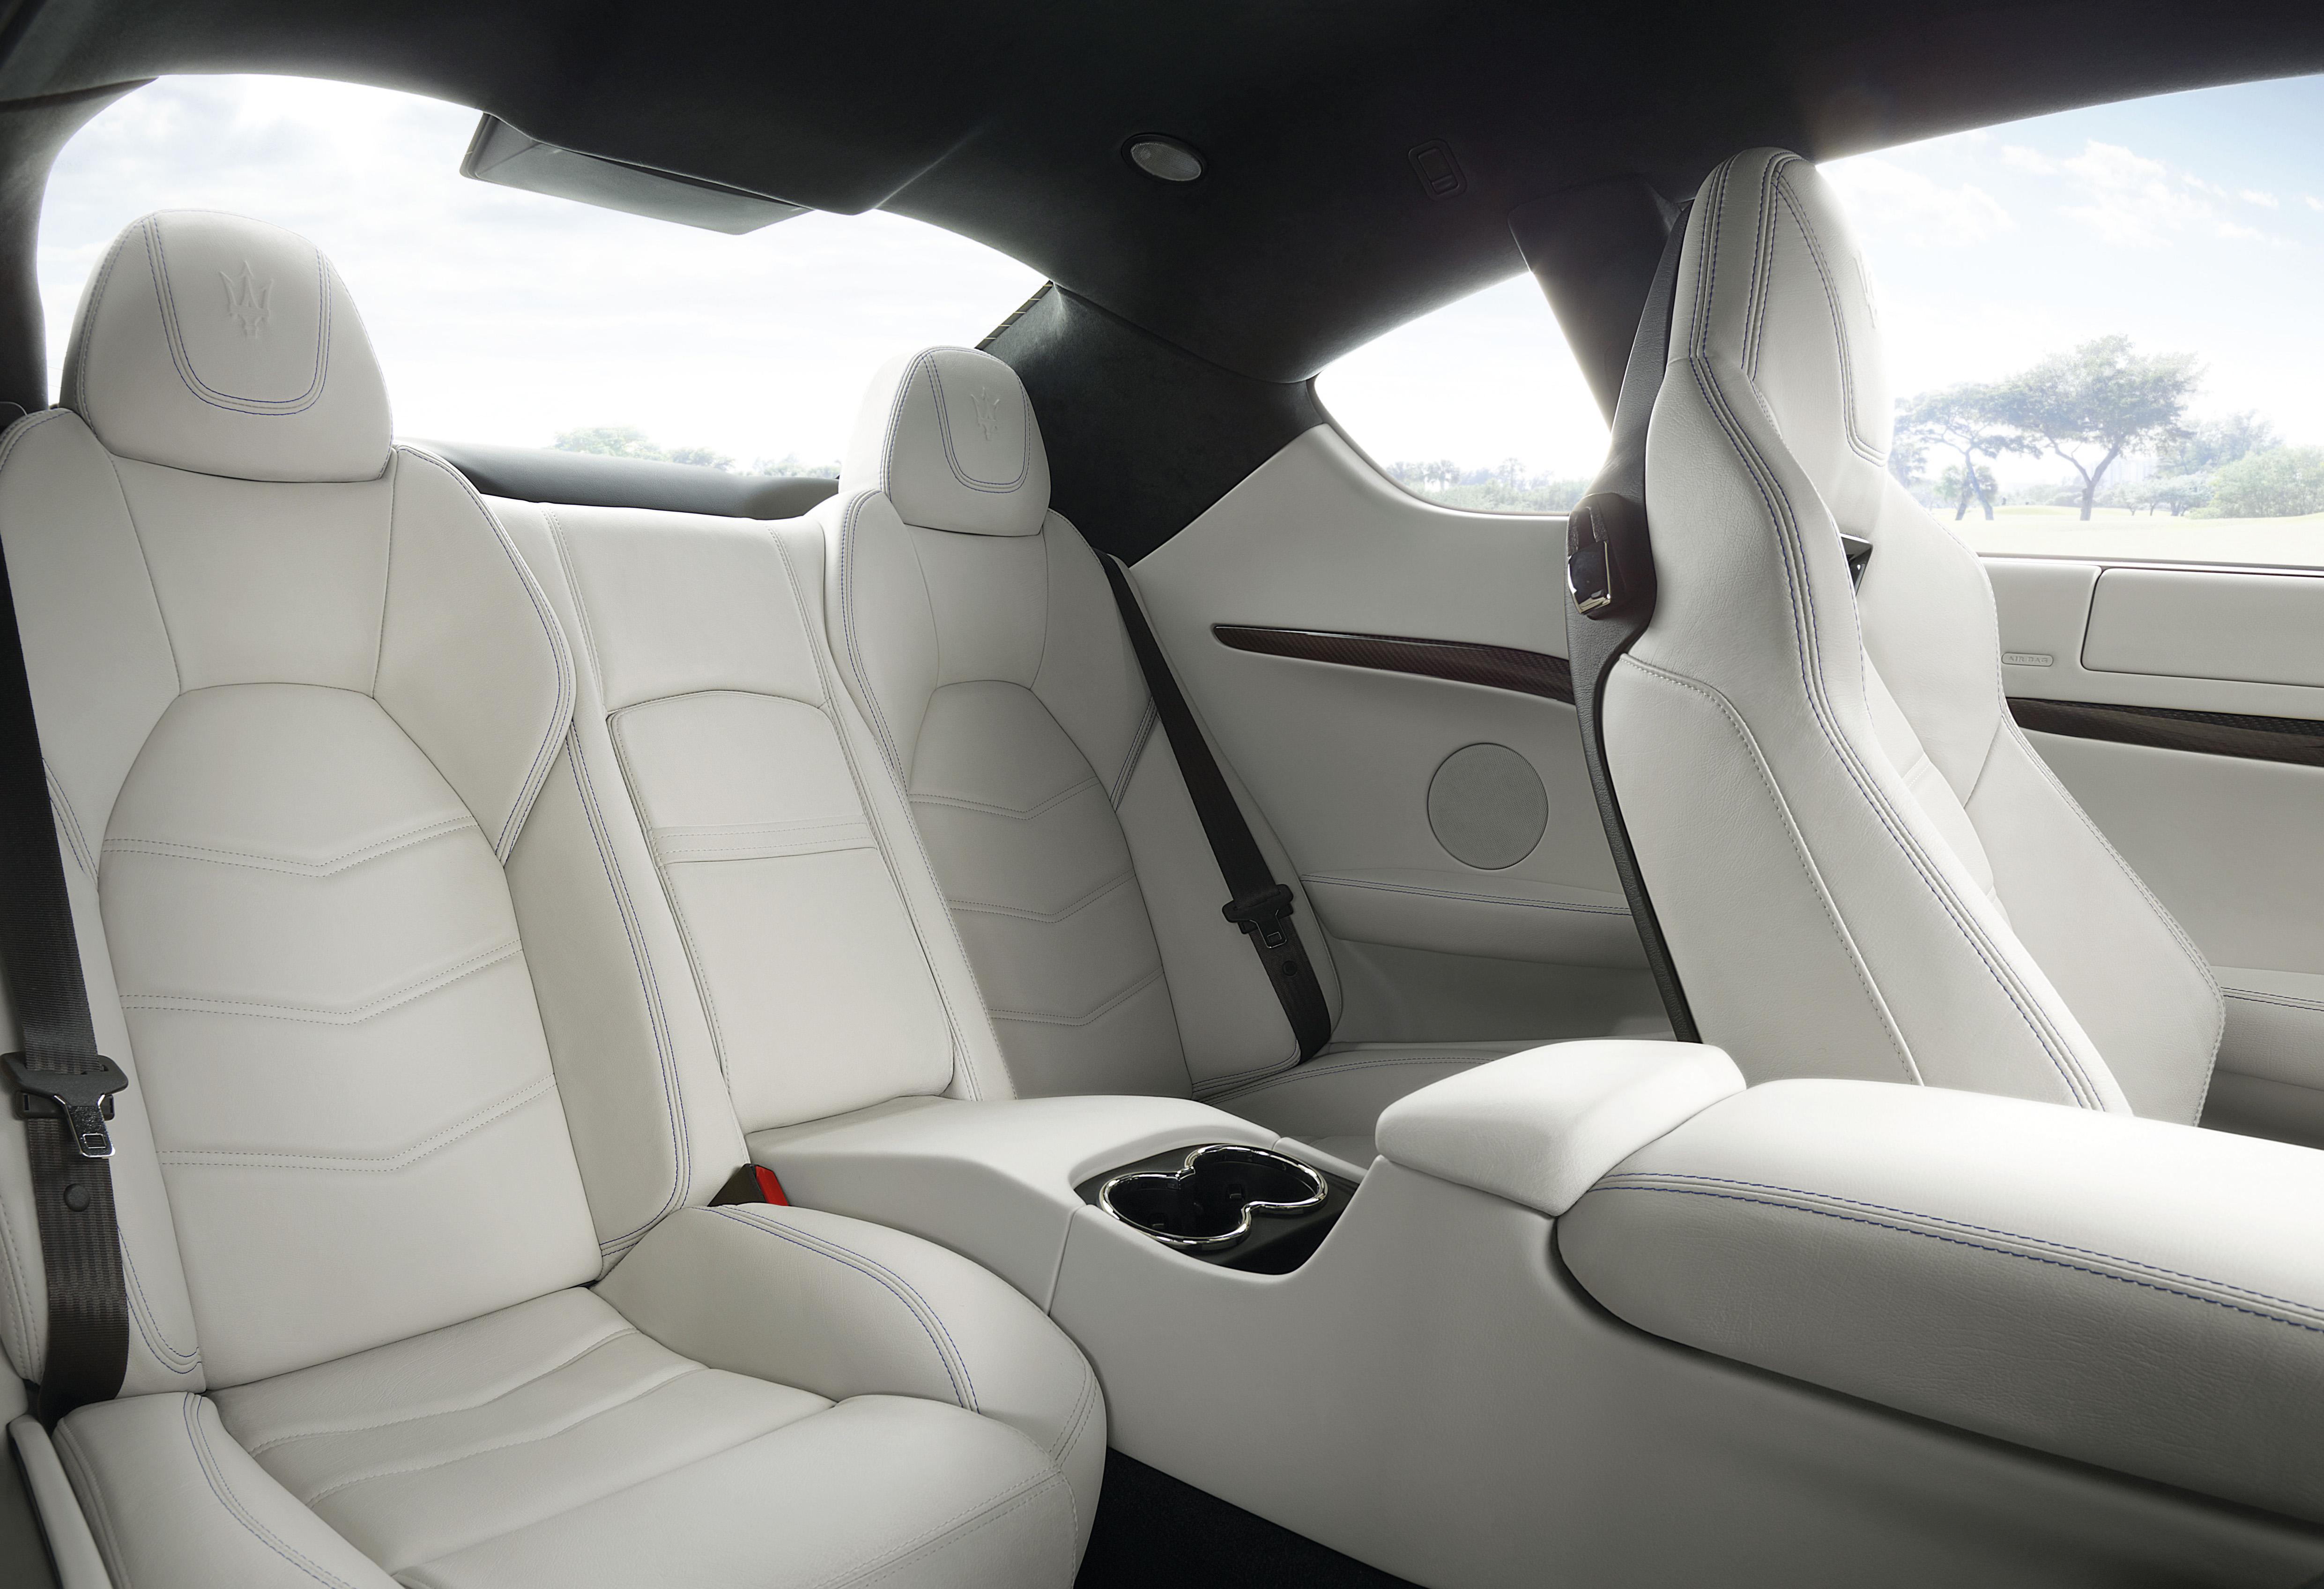 Maserati granturismo morrie 39 s luxury auto for Maserati granturismo s interieur